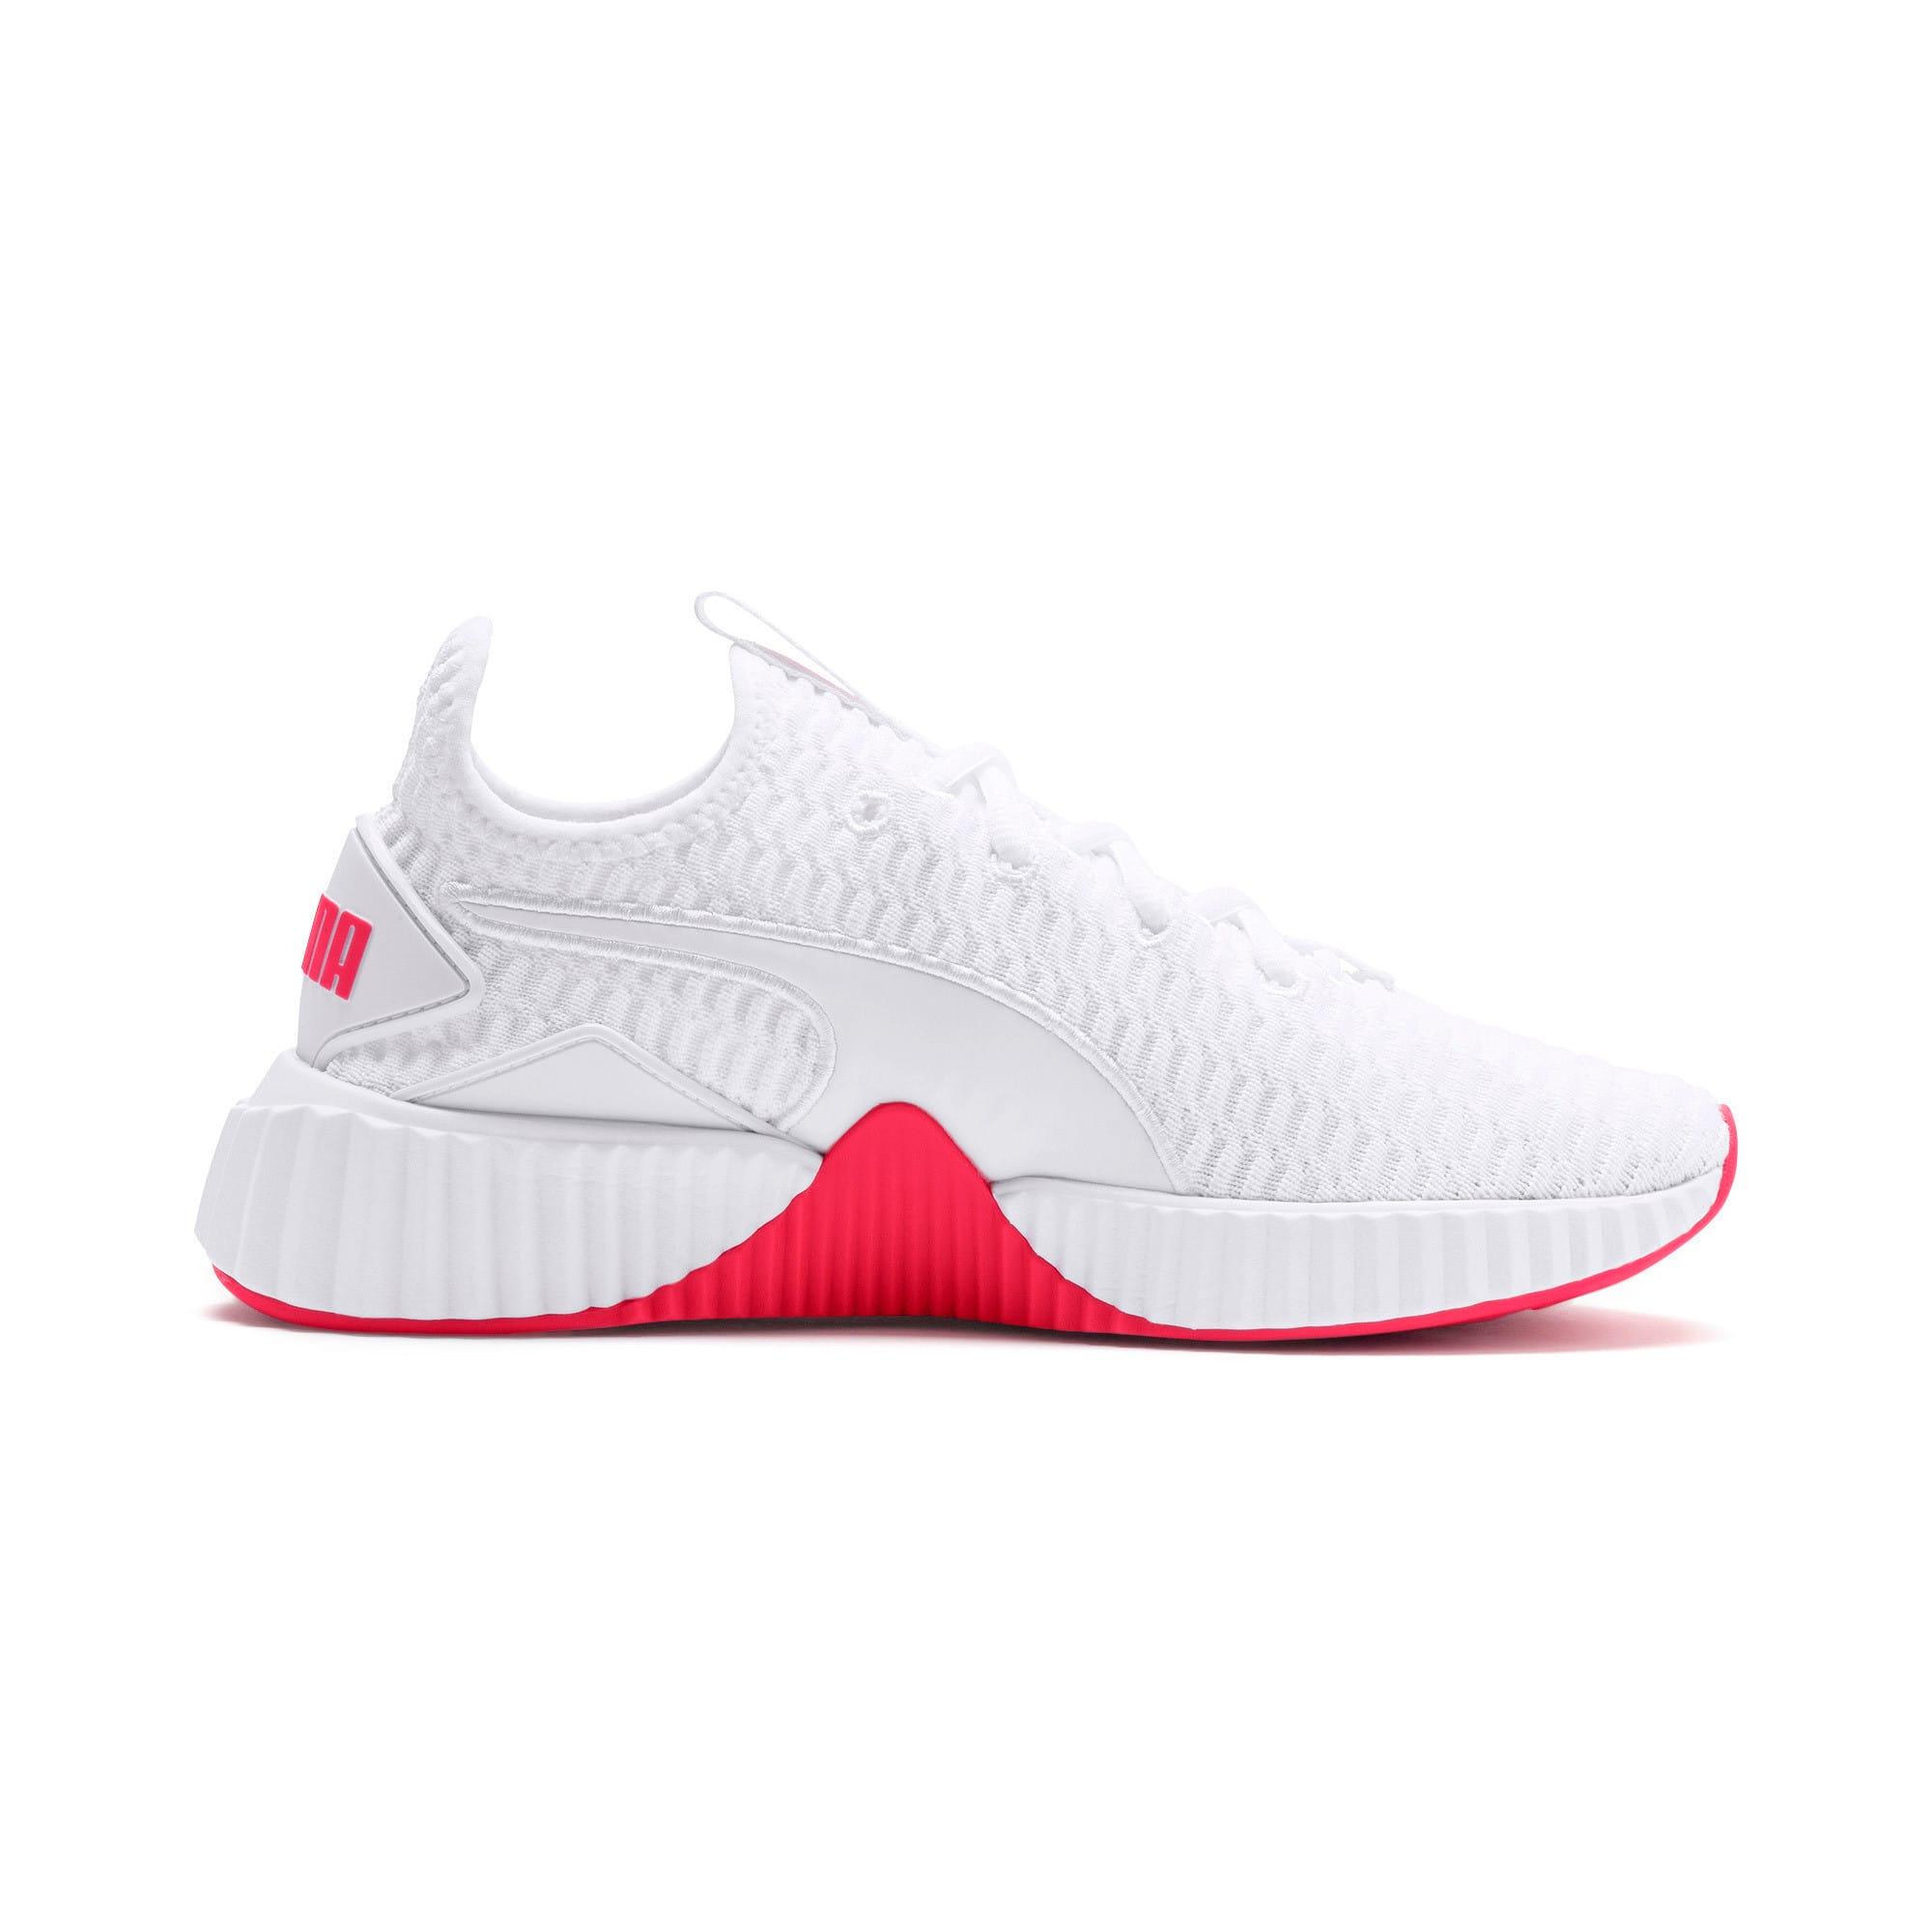 Thumbnail 6 of Defy Damen Sneaker, Puma White-Pink Alert, medium